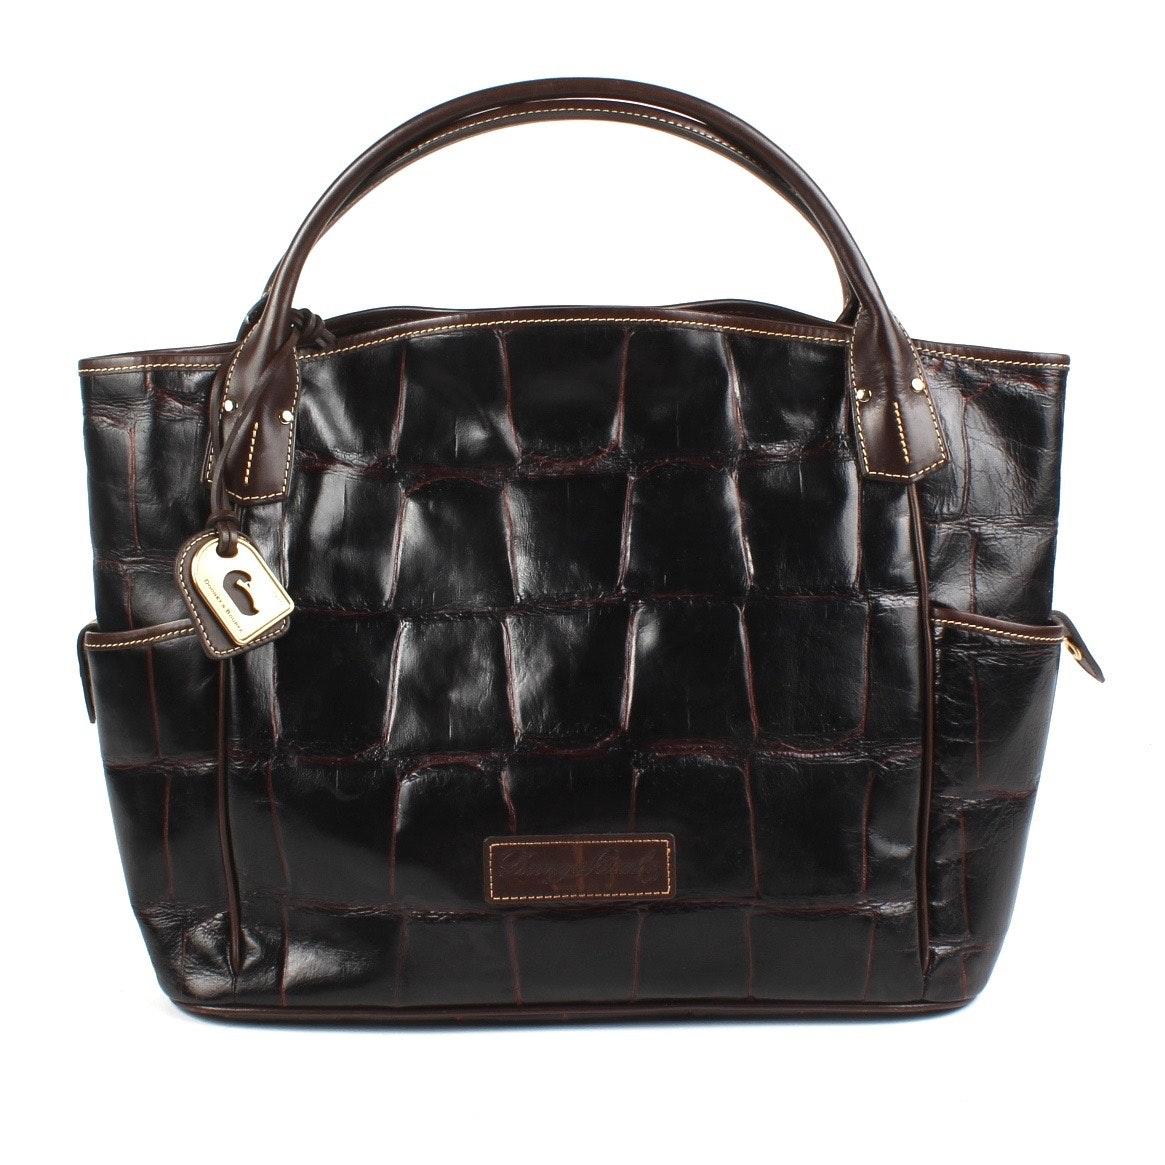 Dooney & Bourke Kristen Leather Tote